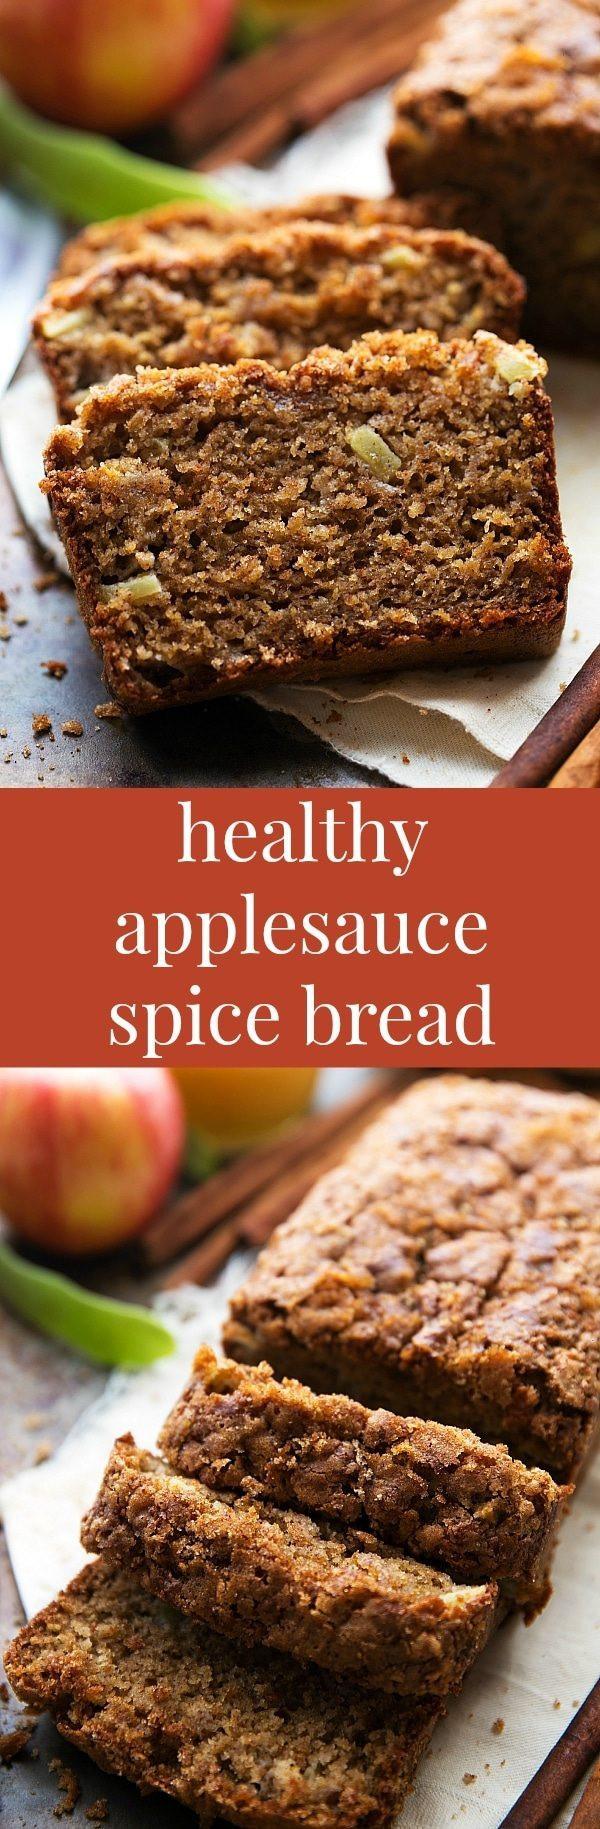 Healthy Pumpkin Bread With Applesauce  Healthier Applesauce Spice Bread Chelsea s Messy Apron